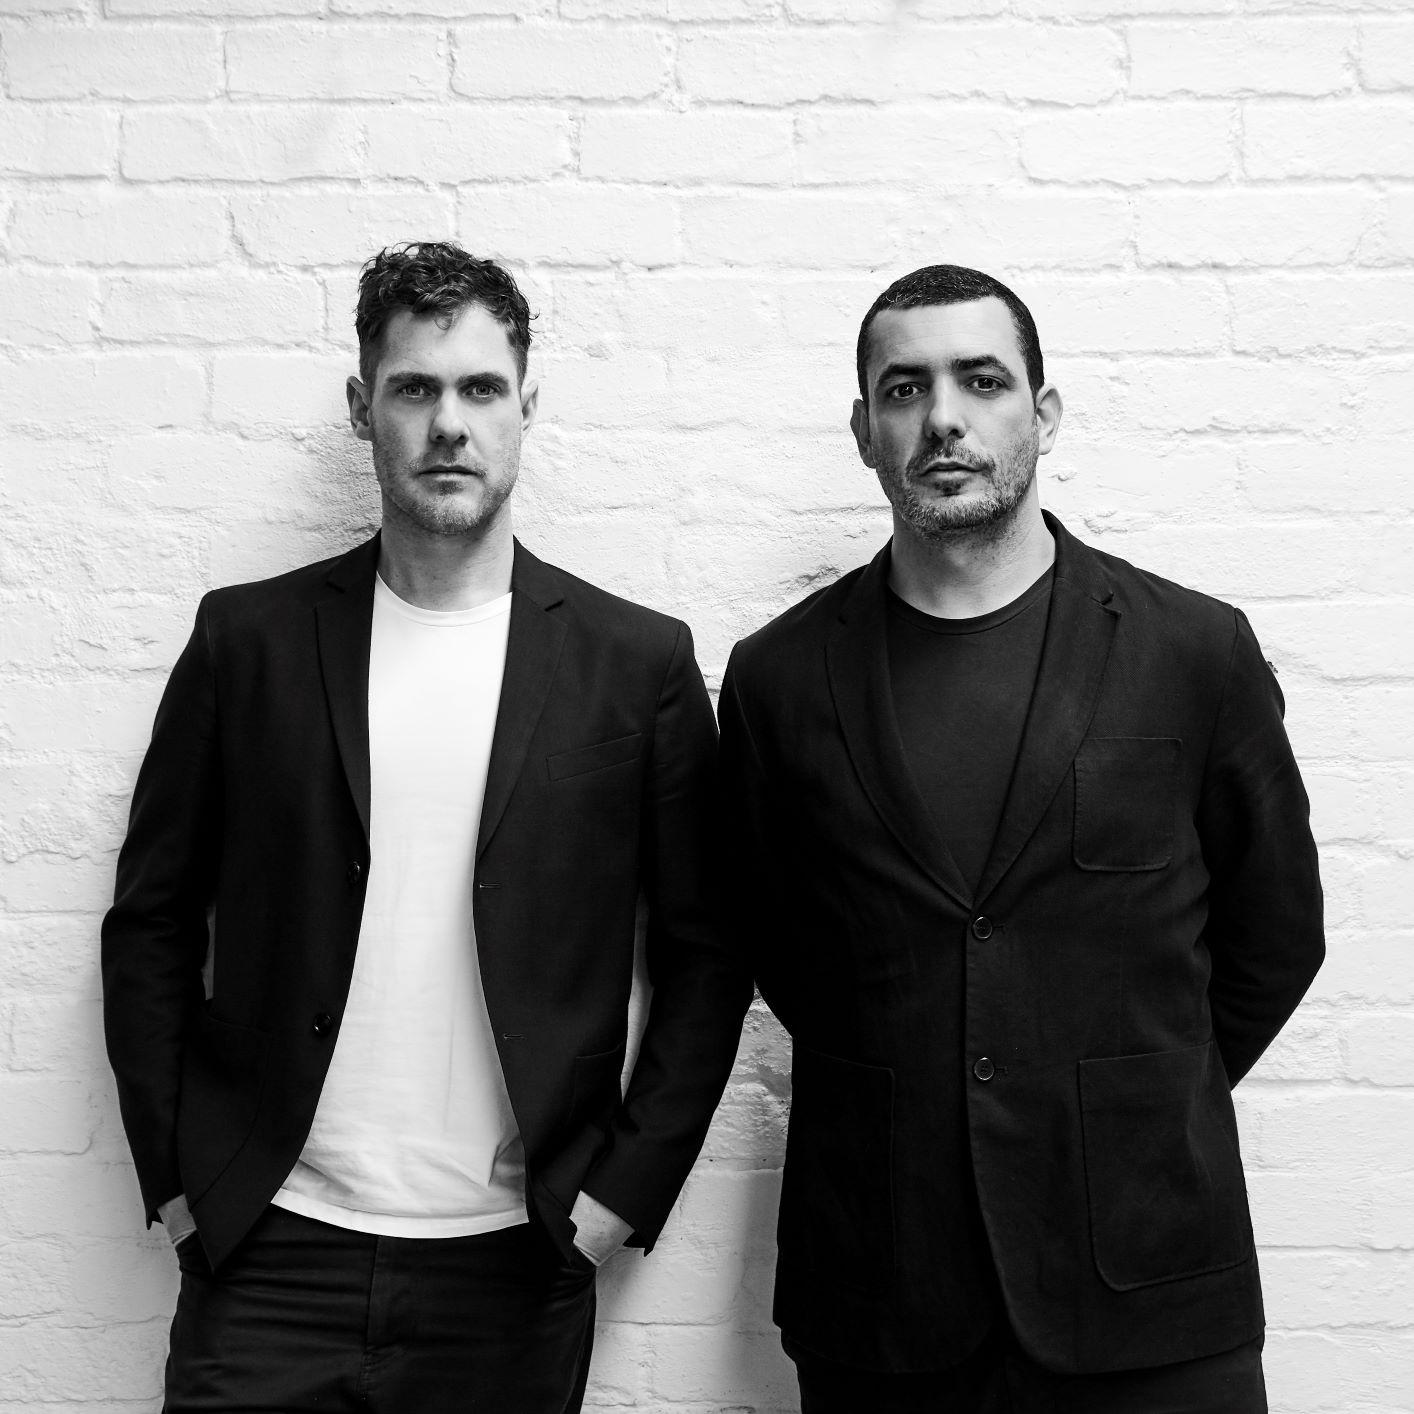 David Flack and Mark Robinson, Flack Studio. Portrait c/o Flack Studio.